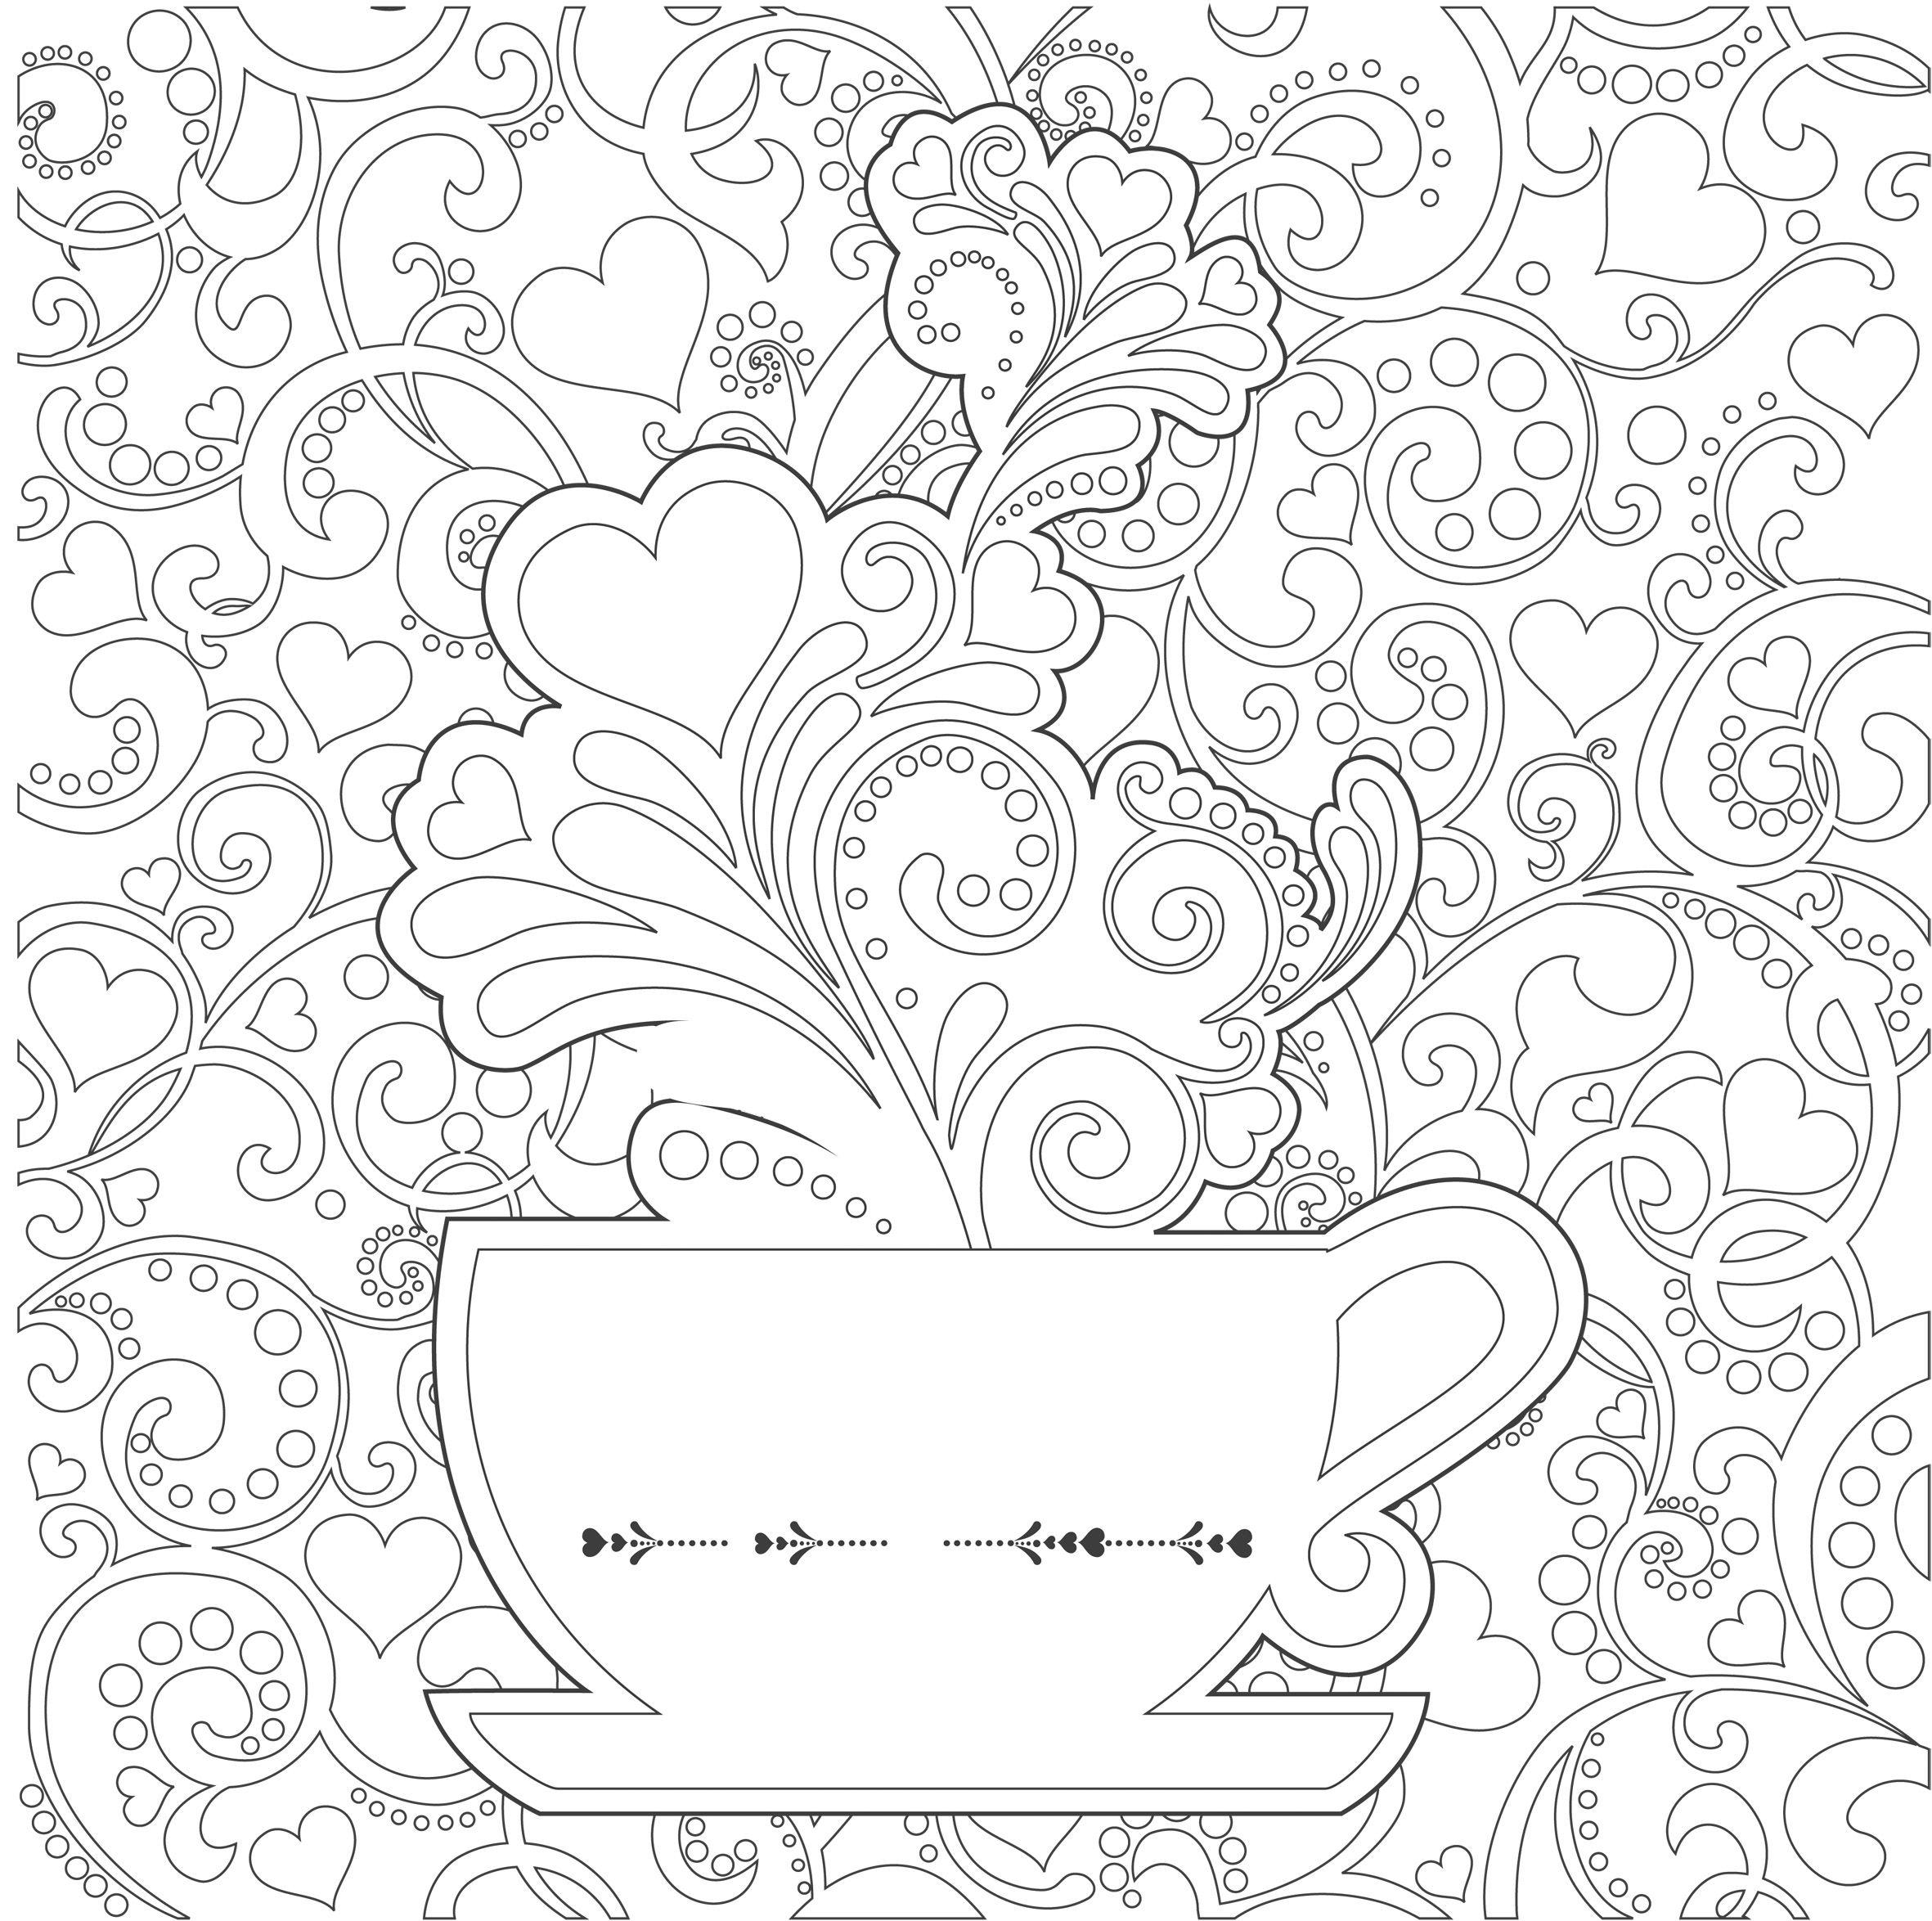 coloriage anti stress vintage a imprimer